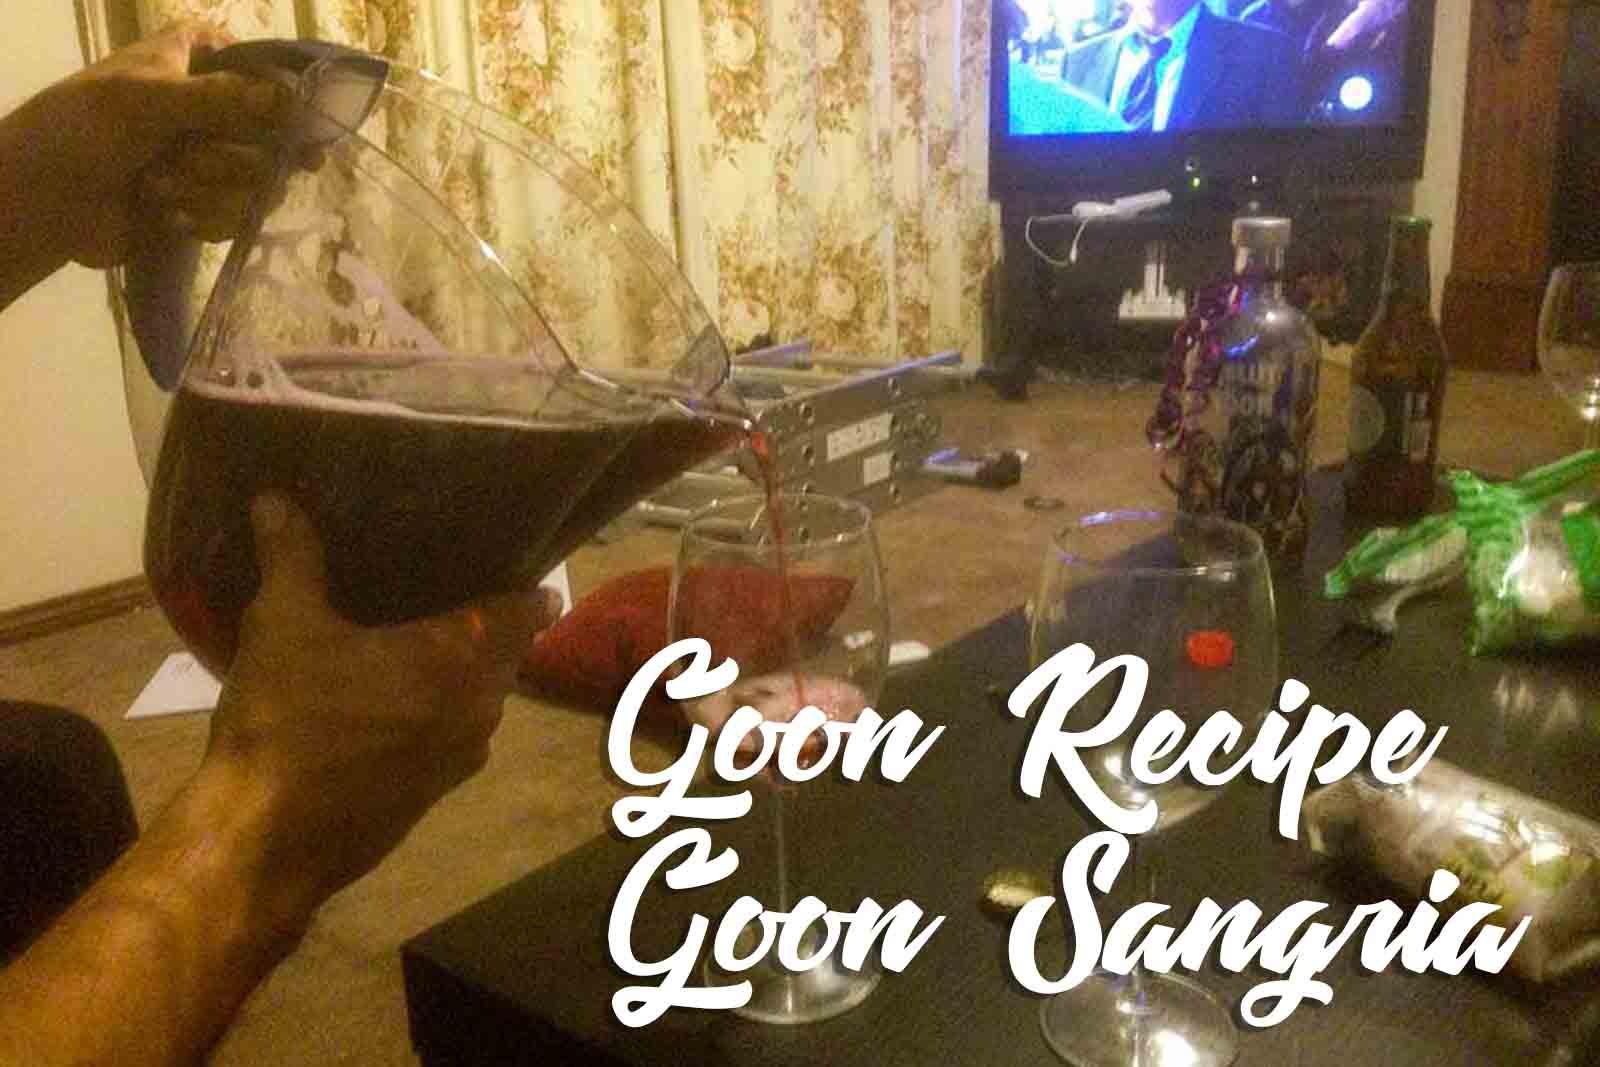 Goon Sangria-ish | Goon Recipe